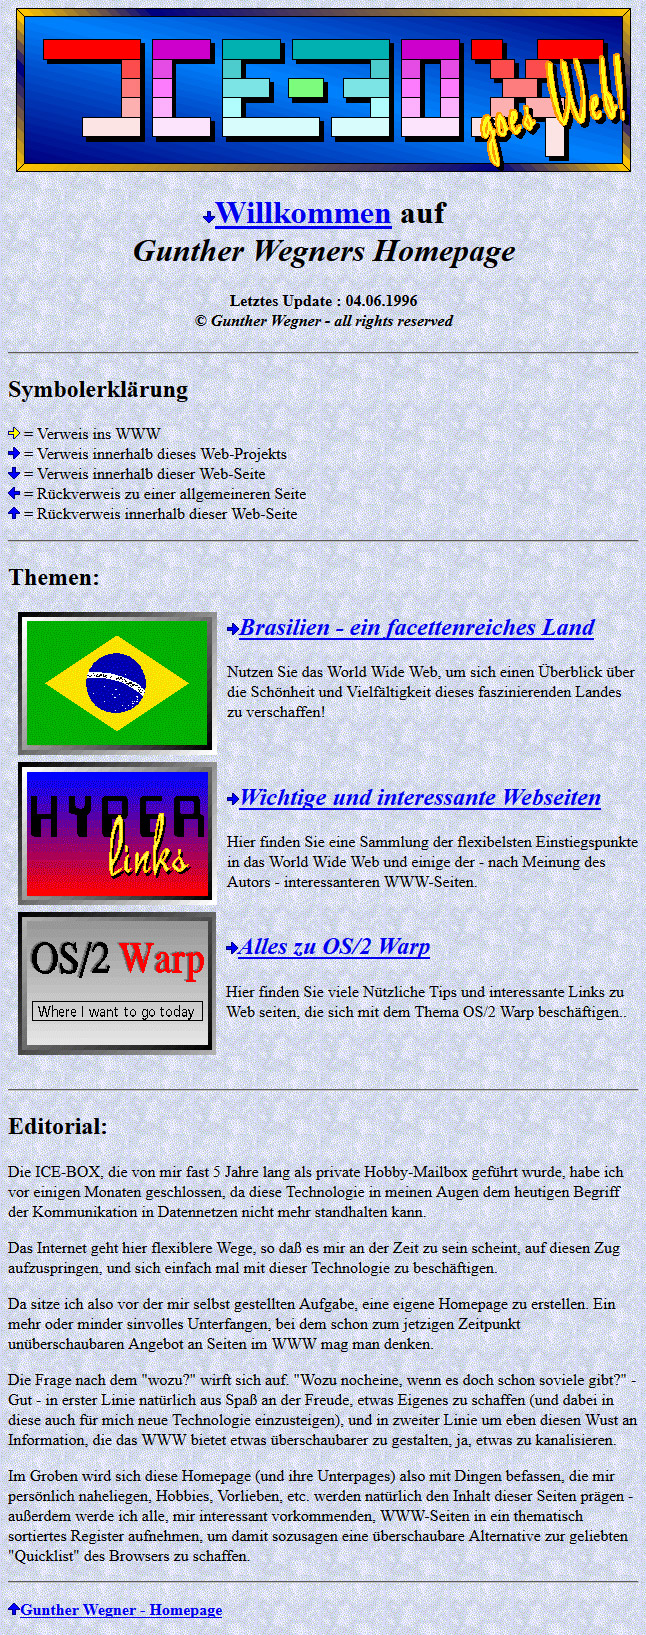 gwegner.de-20-jahre-internet